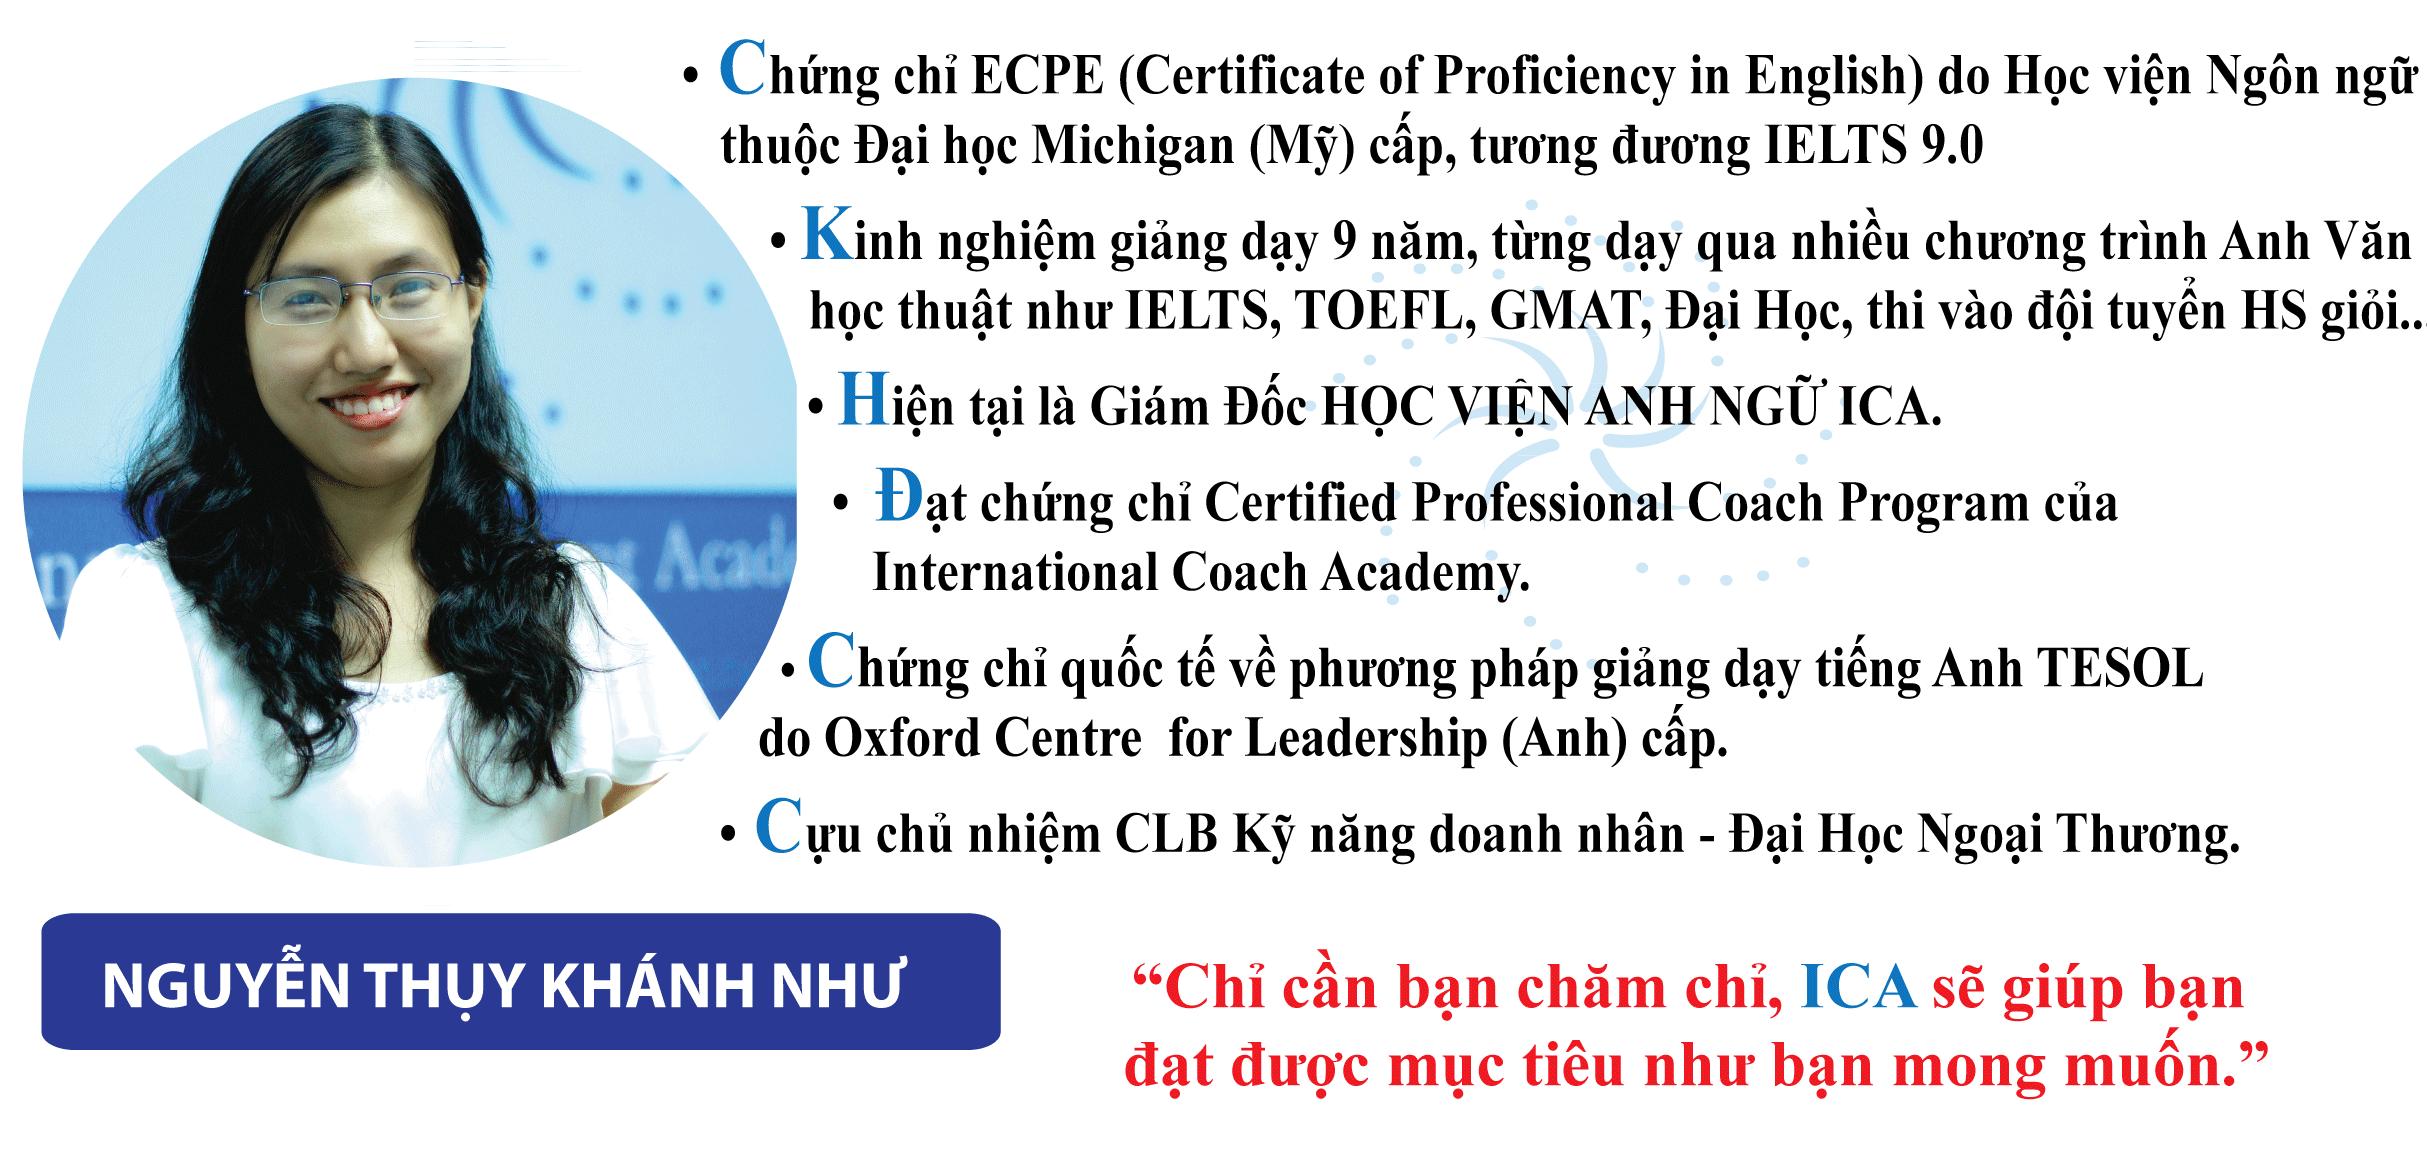 khanhnhu1